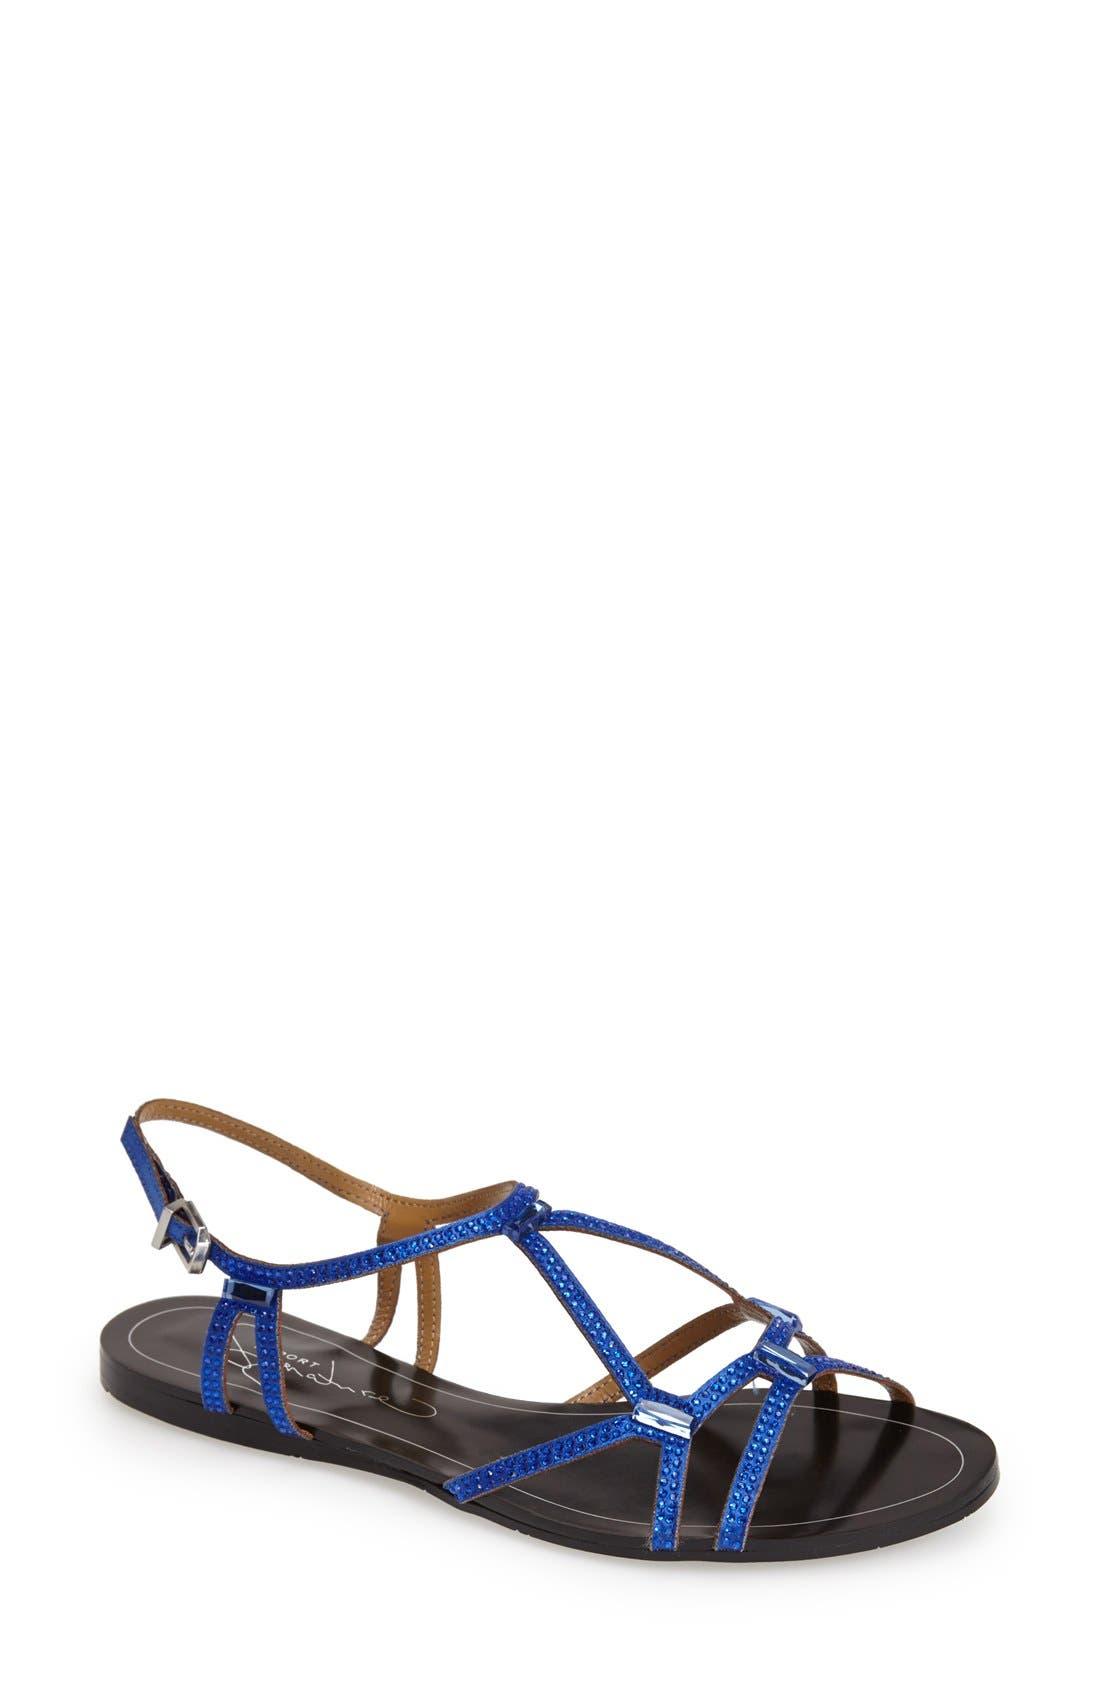 Alternate Image 1 Selected - REPORT Signature 'Sarasota' Crystal Embellished Sandal (Women)